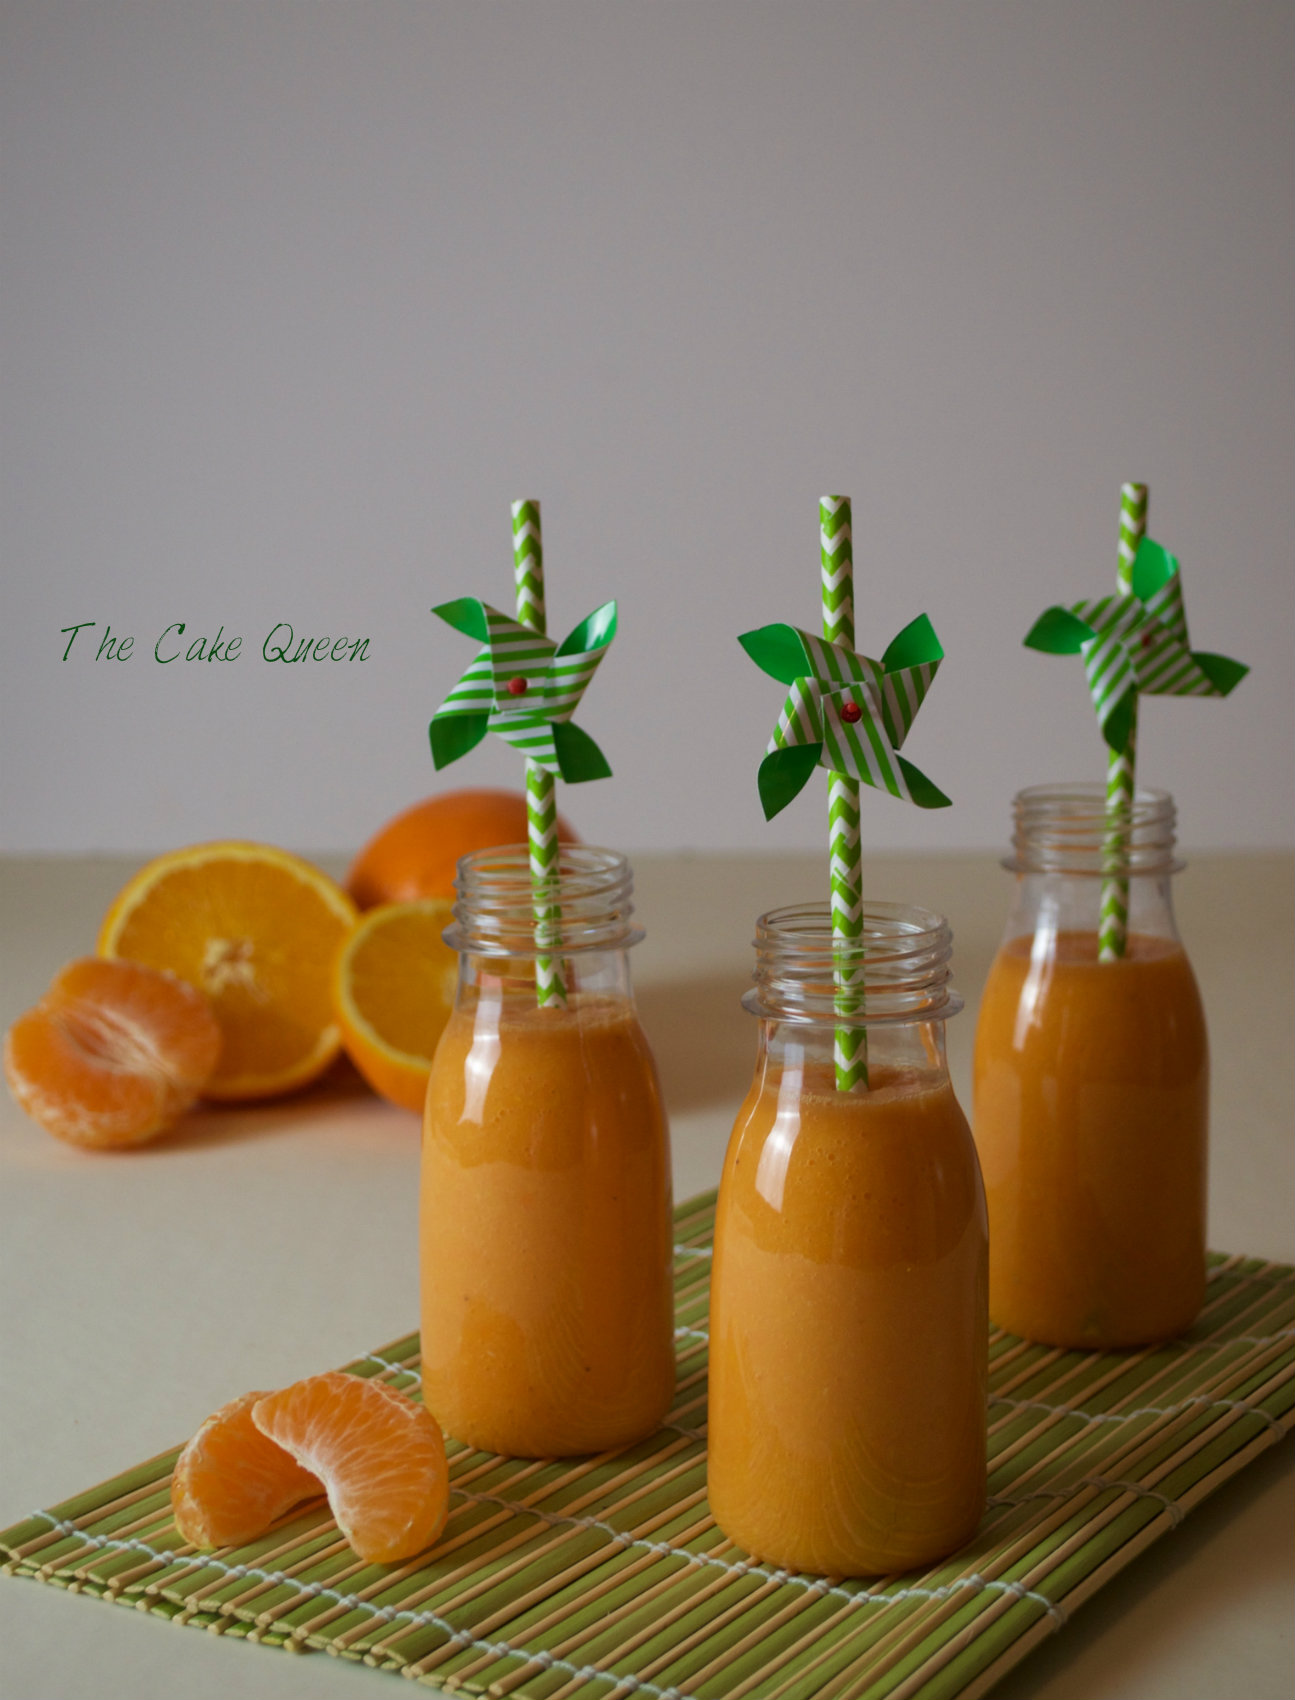 Zumo de naranja y mandarinas 1